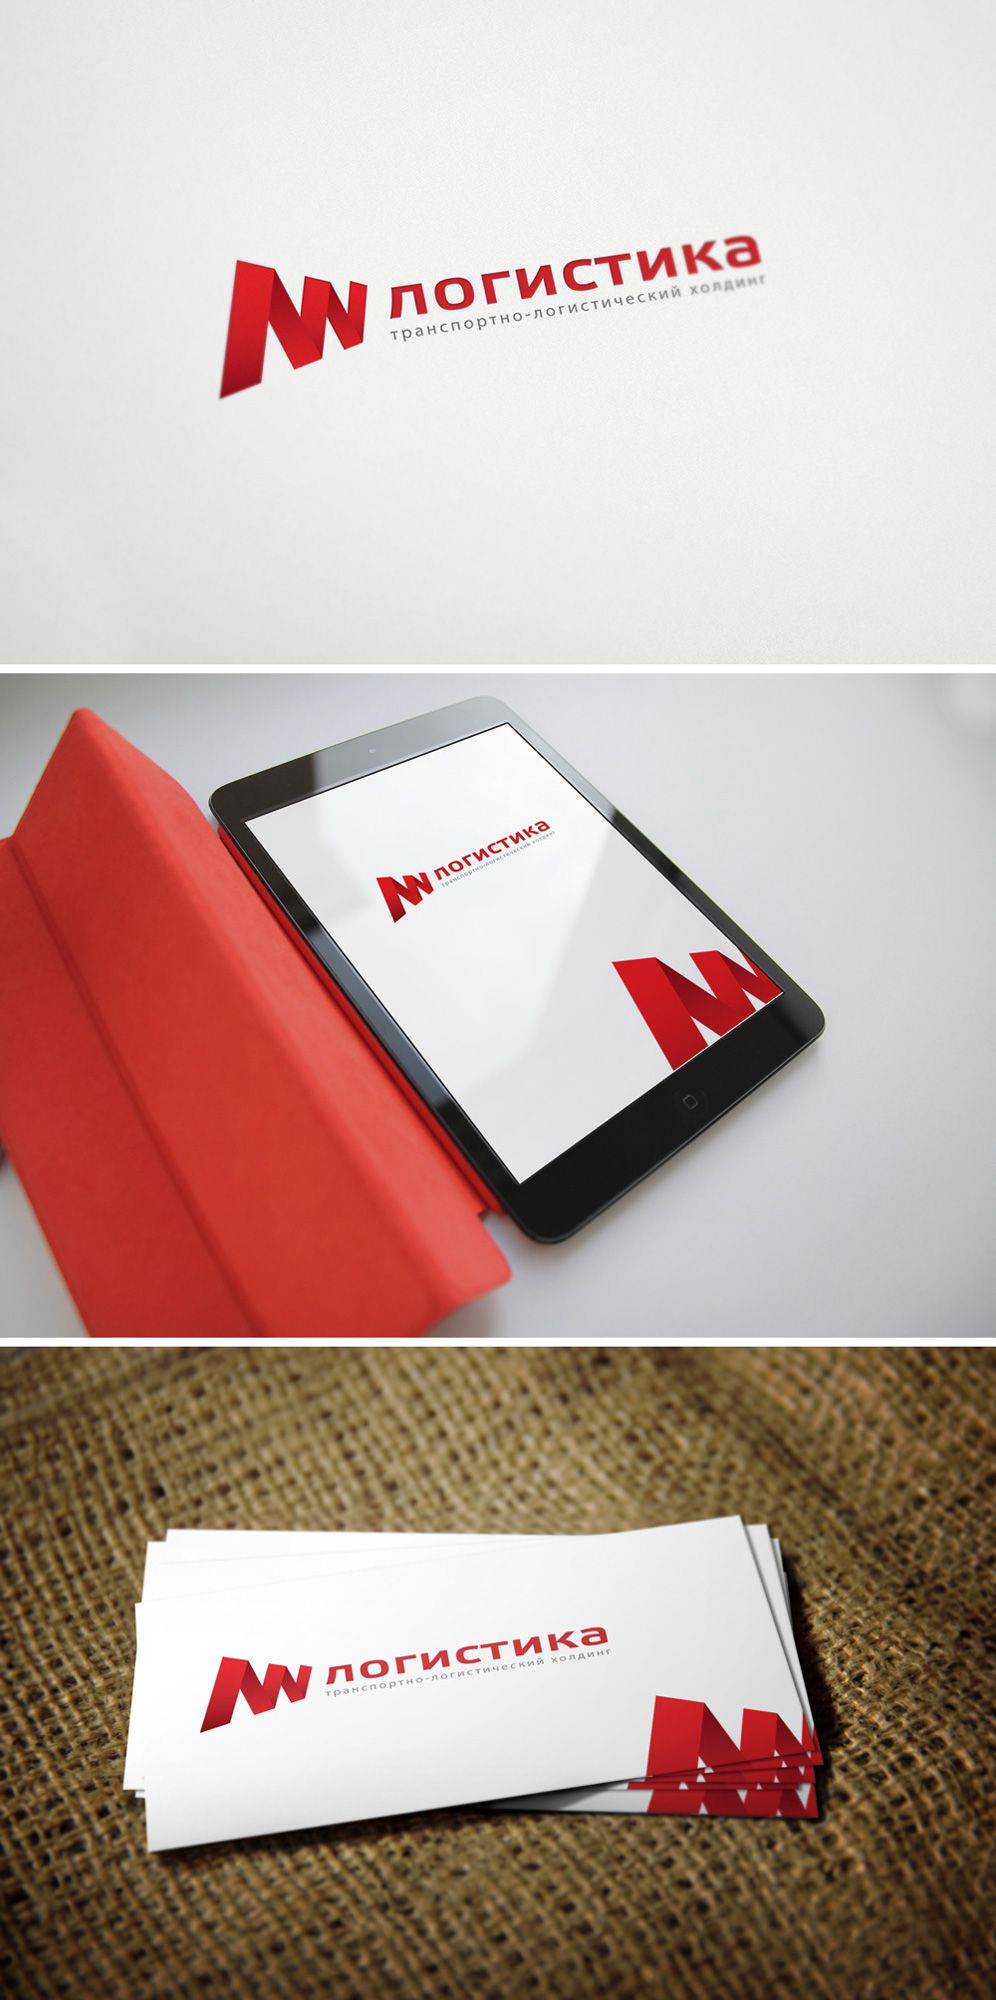 Разработка лого и фирстиля для компании Логистика - дизайнер GreenRed